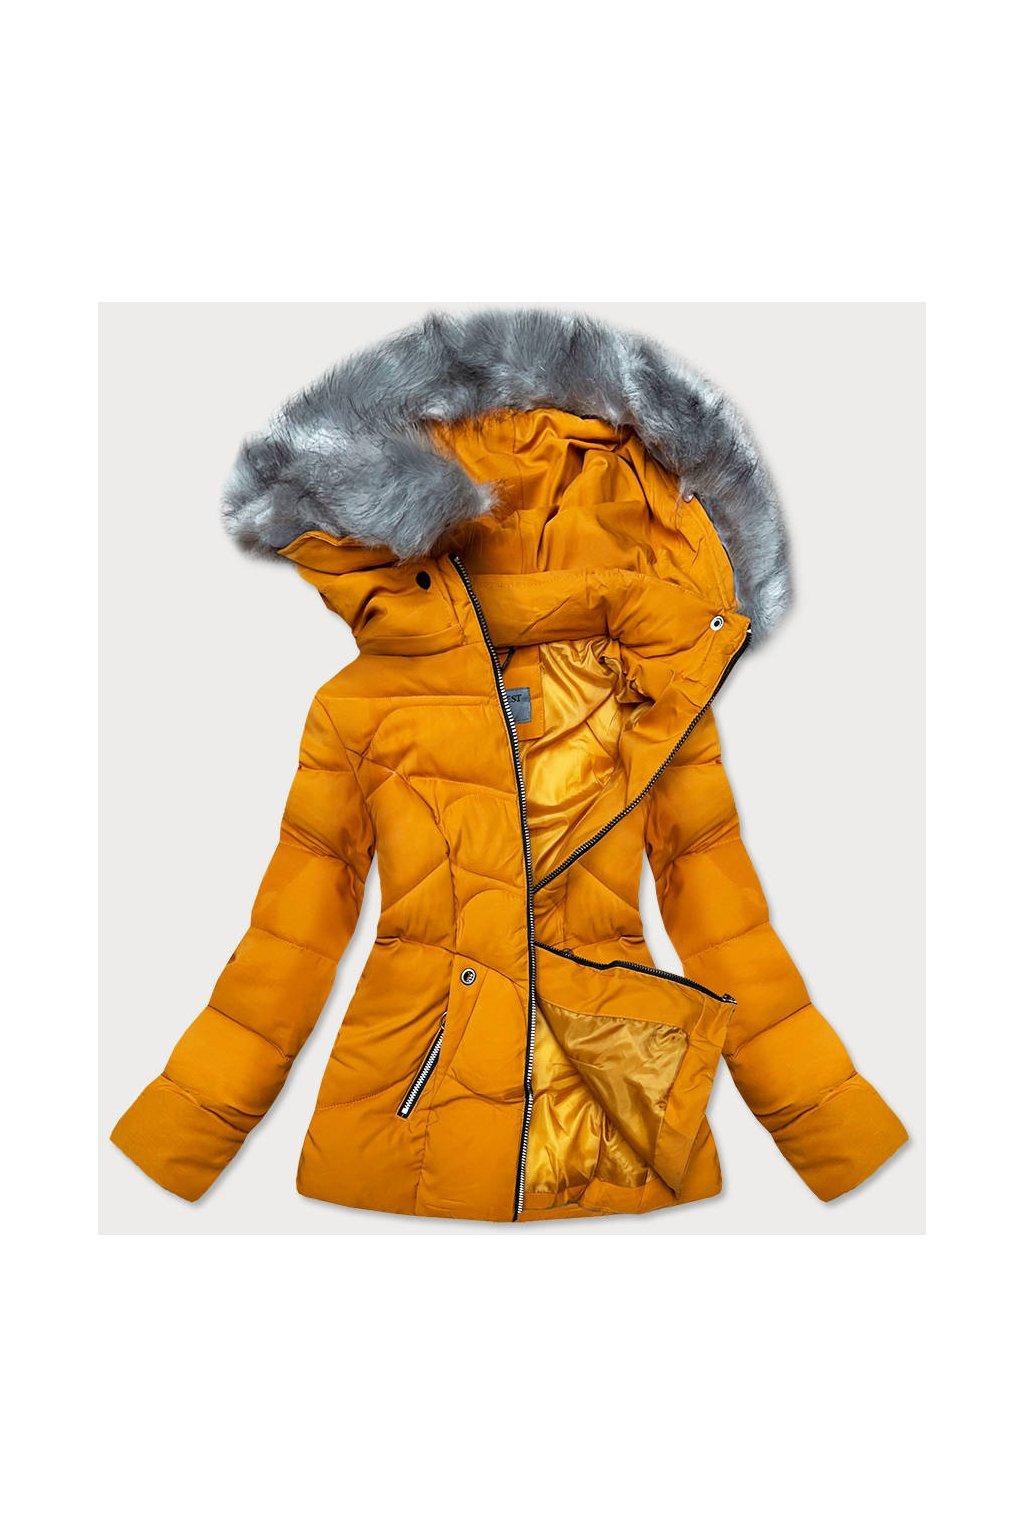 Dámska zimná bunda s kapucňou B9538-3 žltá